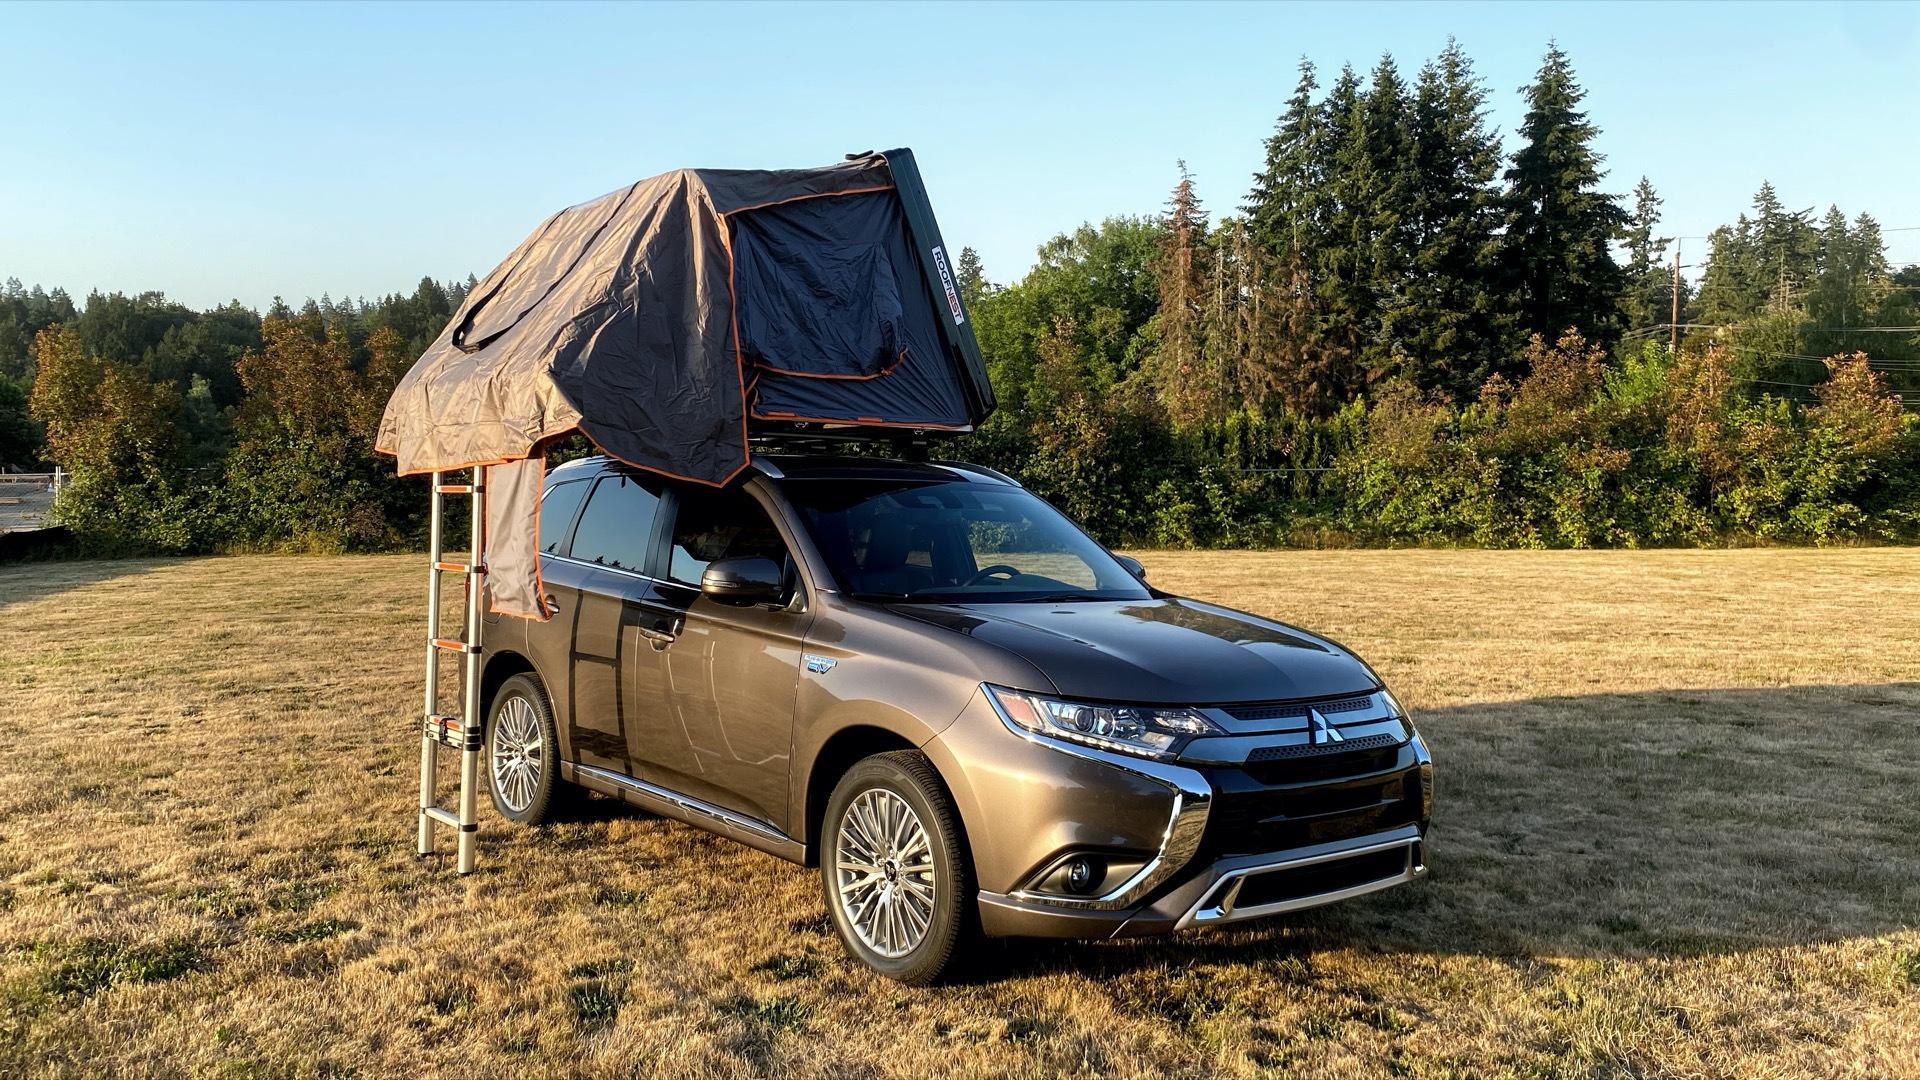 2021 Mitsubishi Outlander Plug-In Hybrid and Roofnest Condor